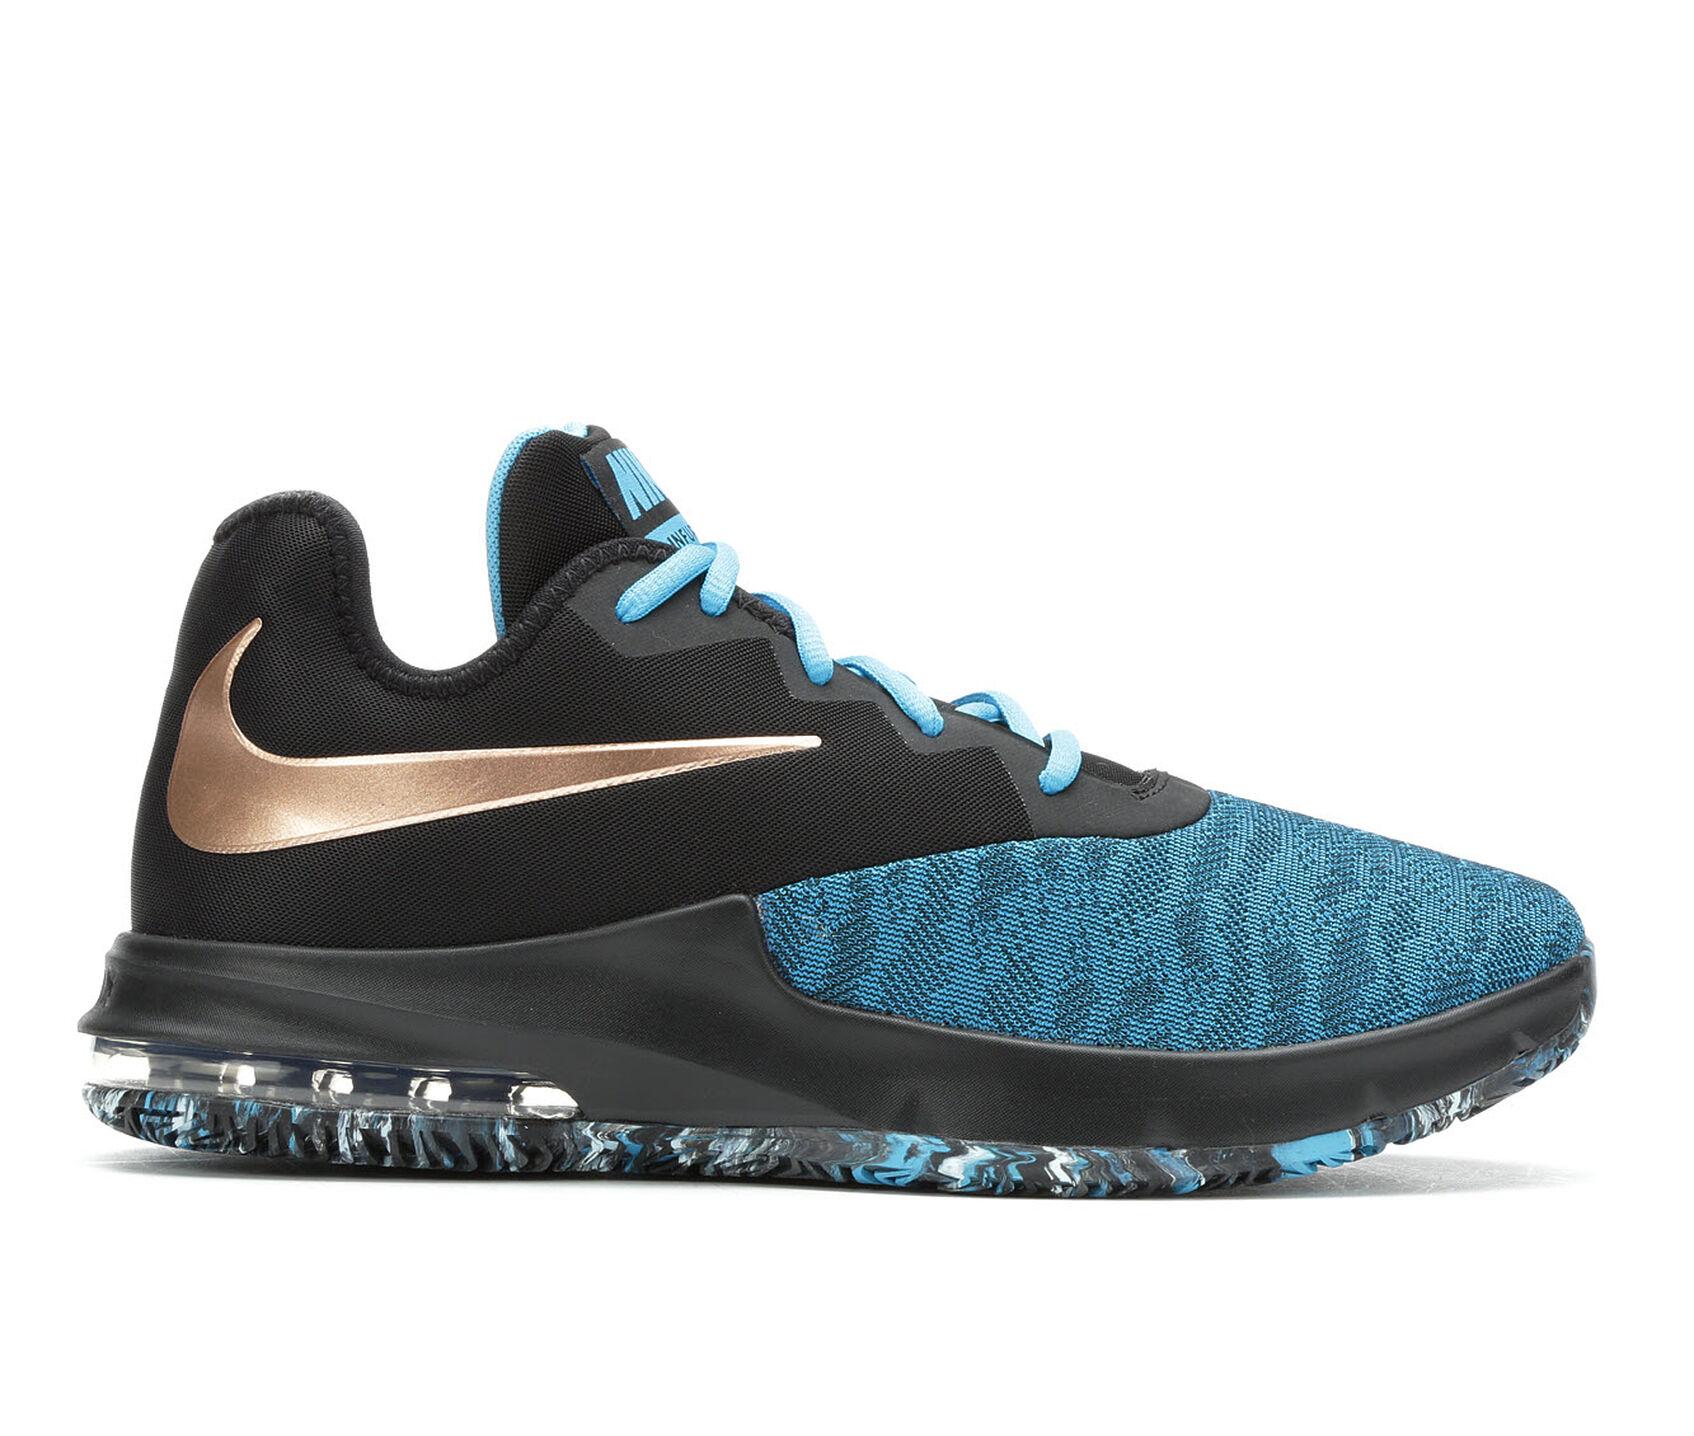 acheter en ligne 35fa0 6f049 Men's Nike Air Max Infuriate III Low Basketball Shoes